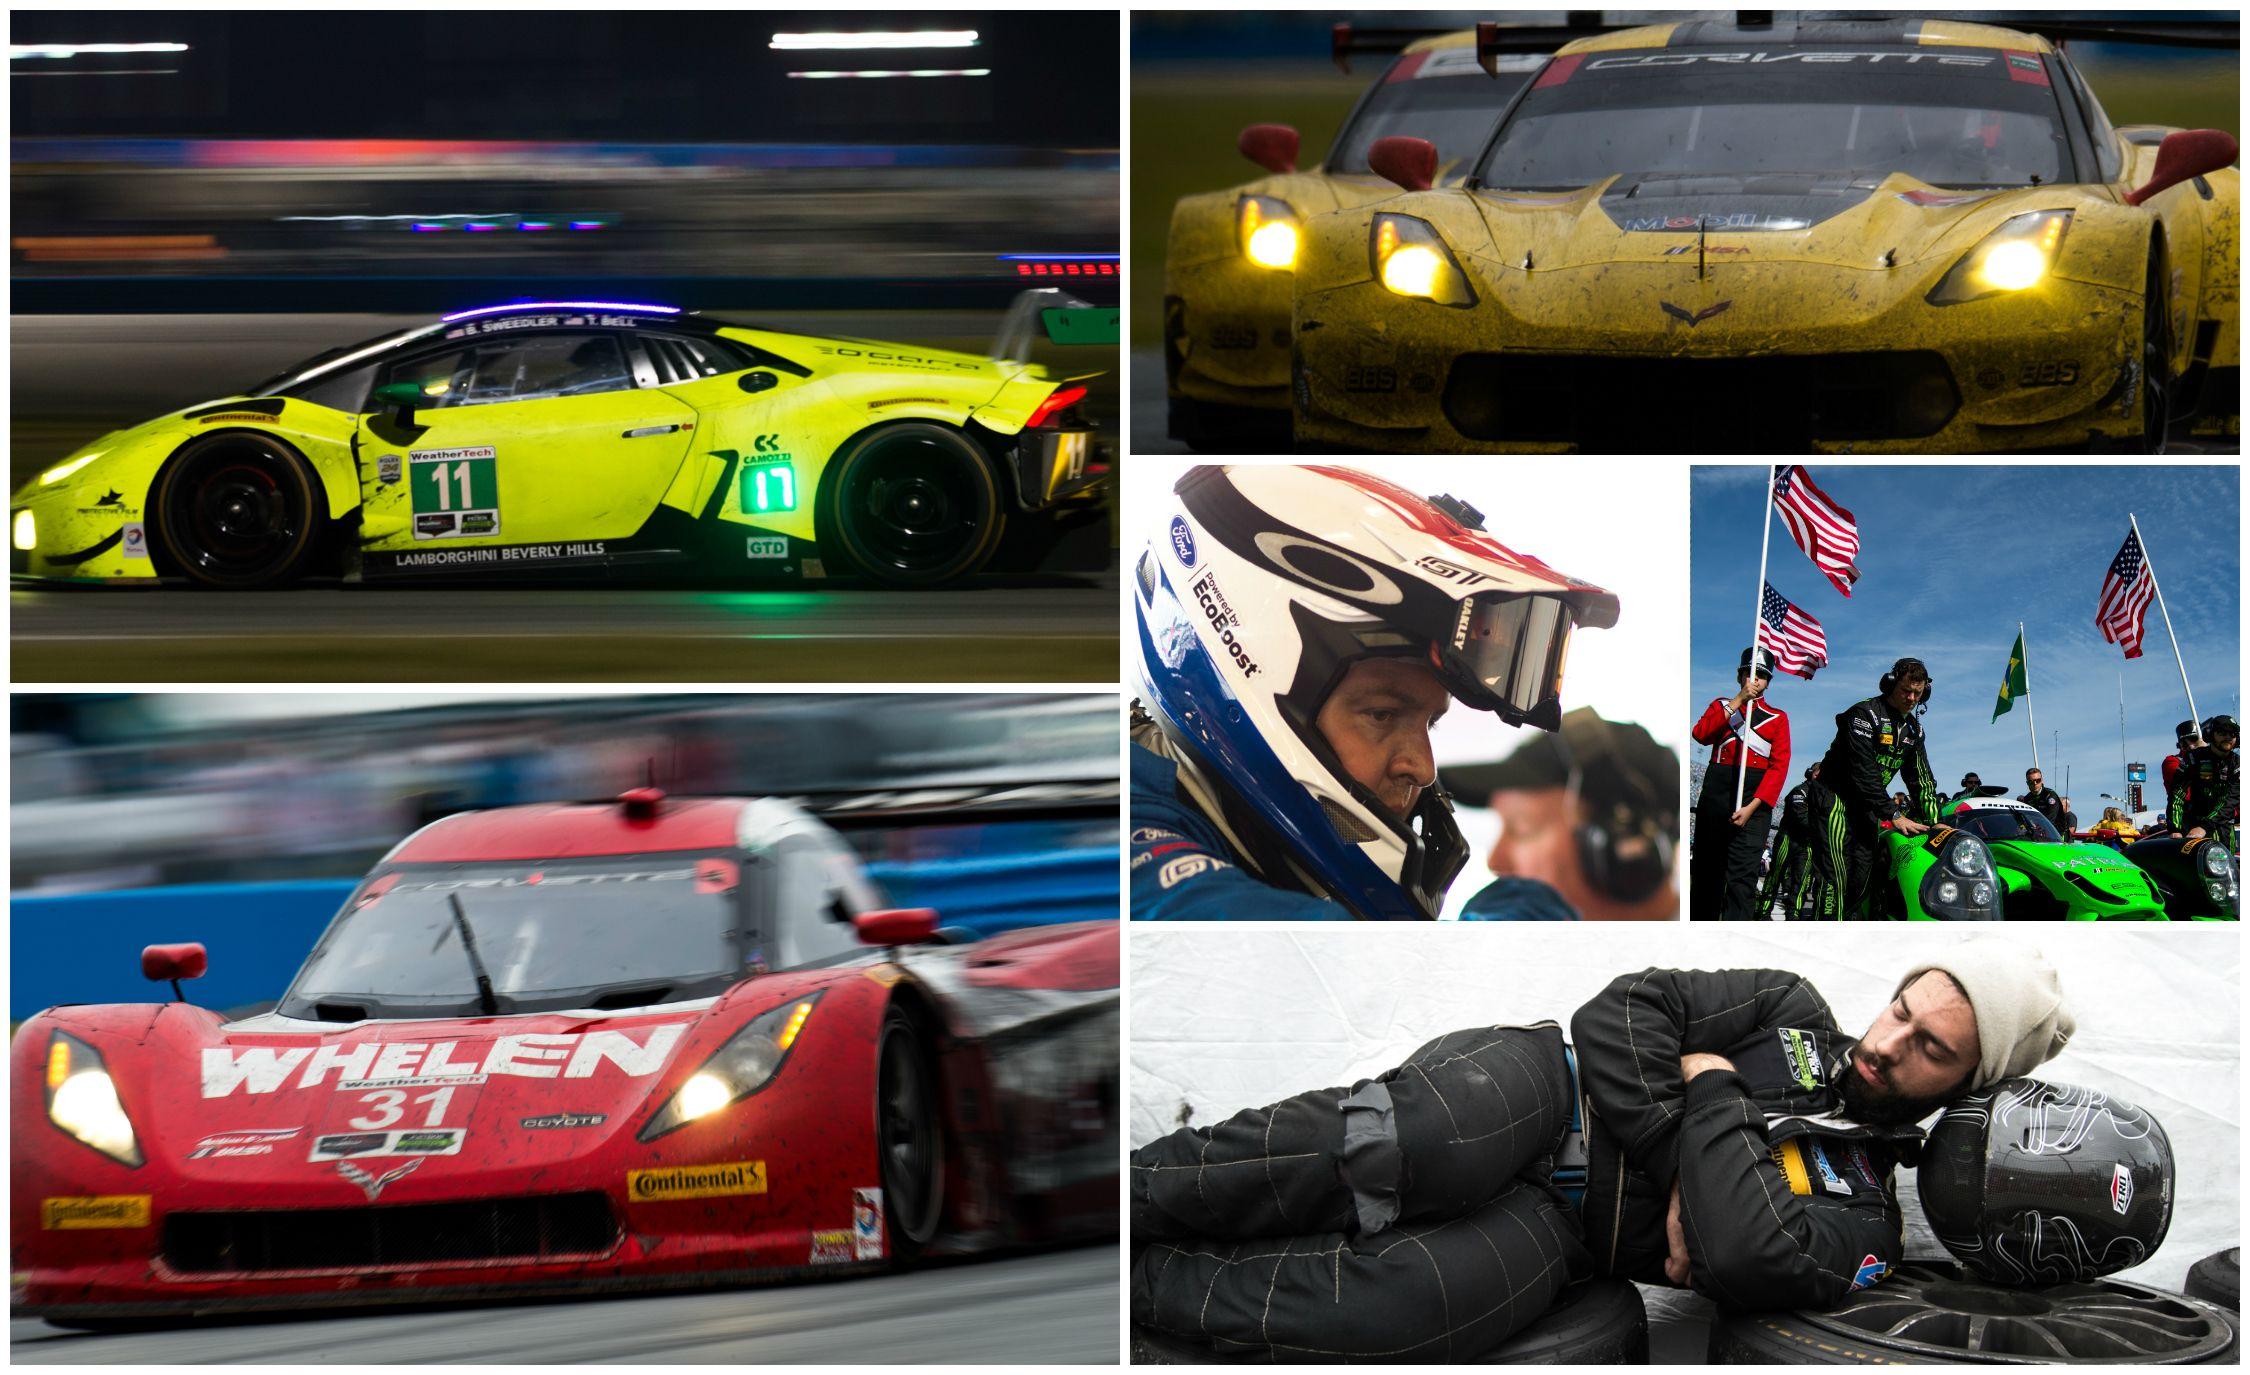 The 2016 24 Hours of Daytona in 40 Stunning Photos